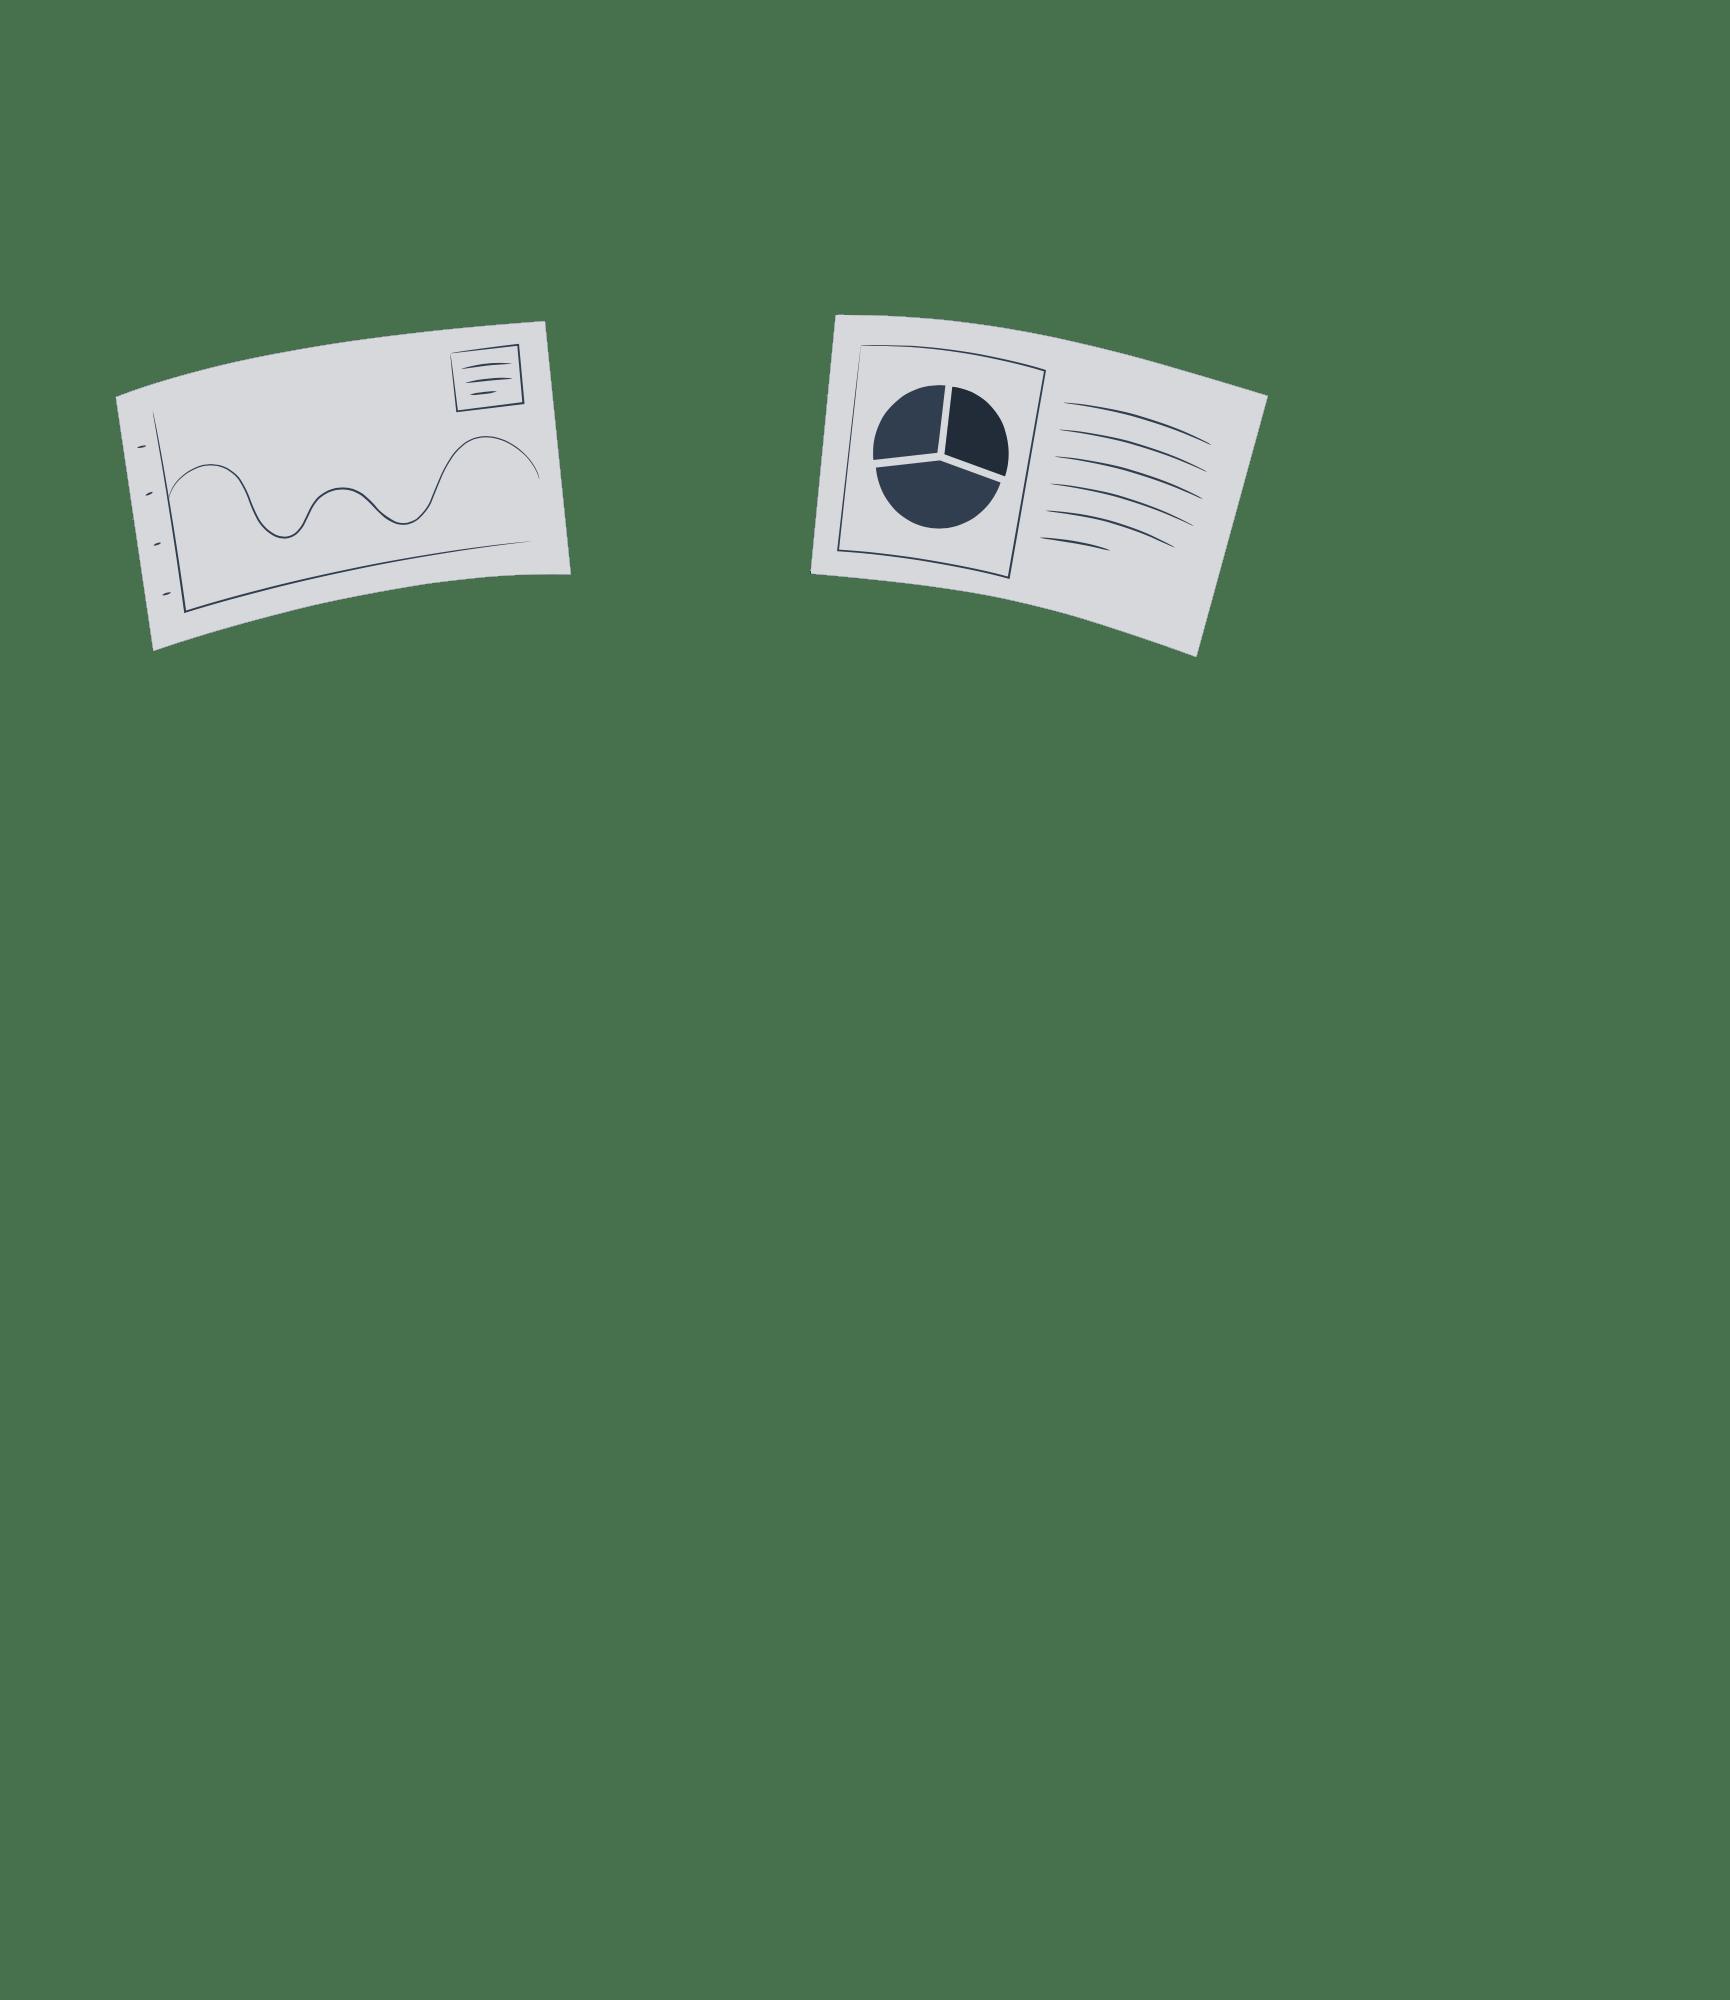 Visual data-pana-3